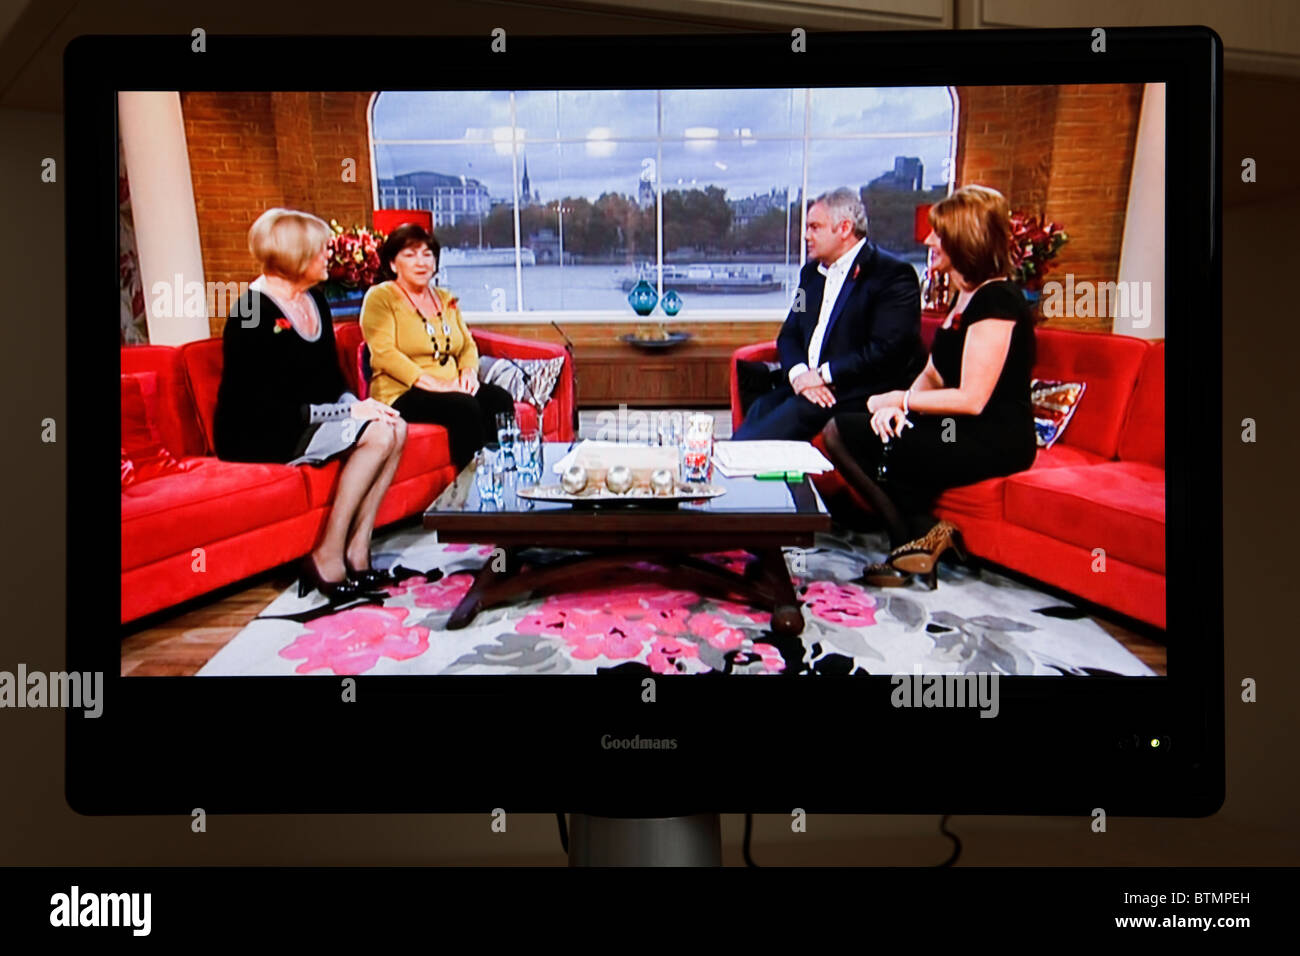 televison programme